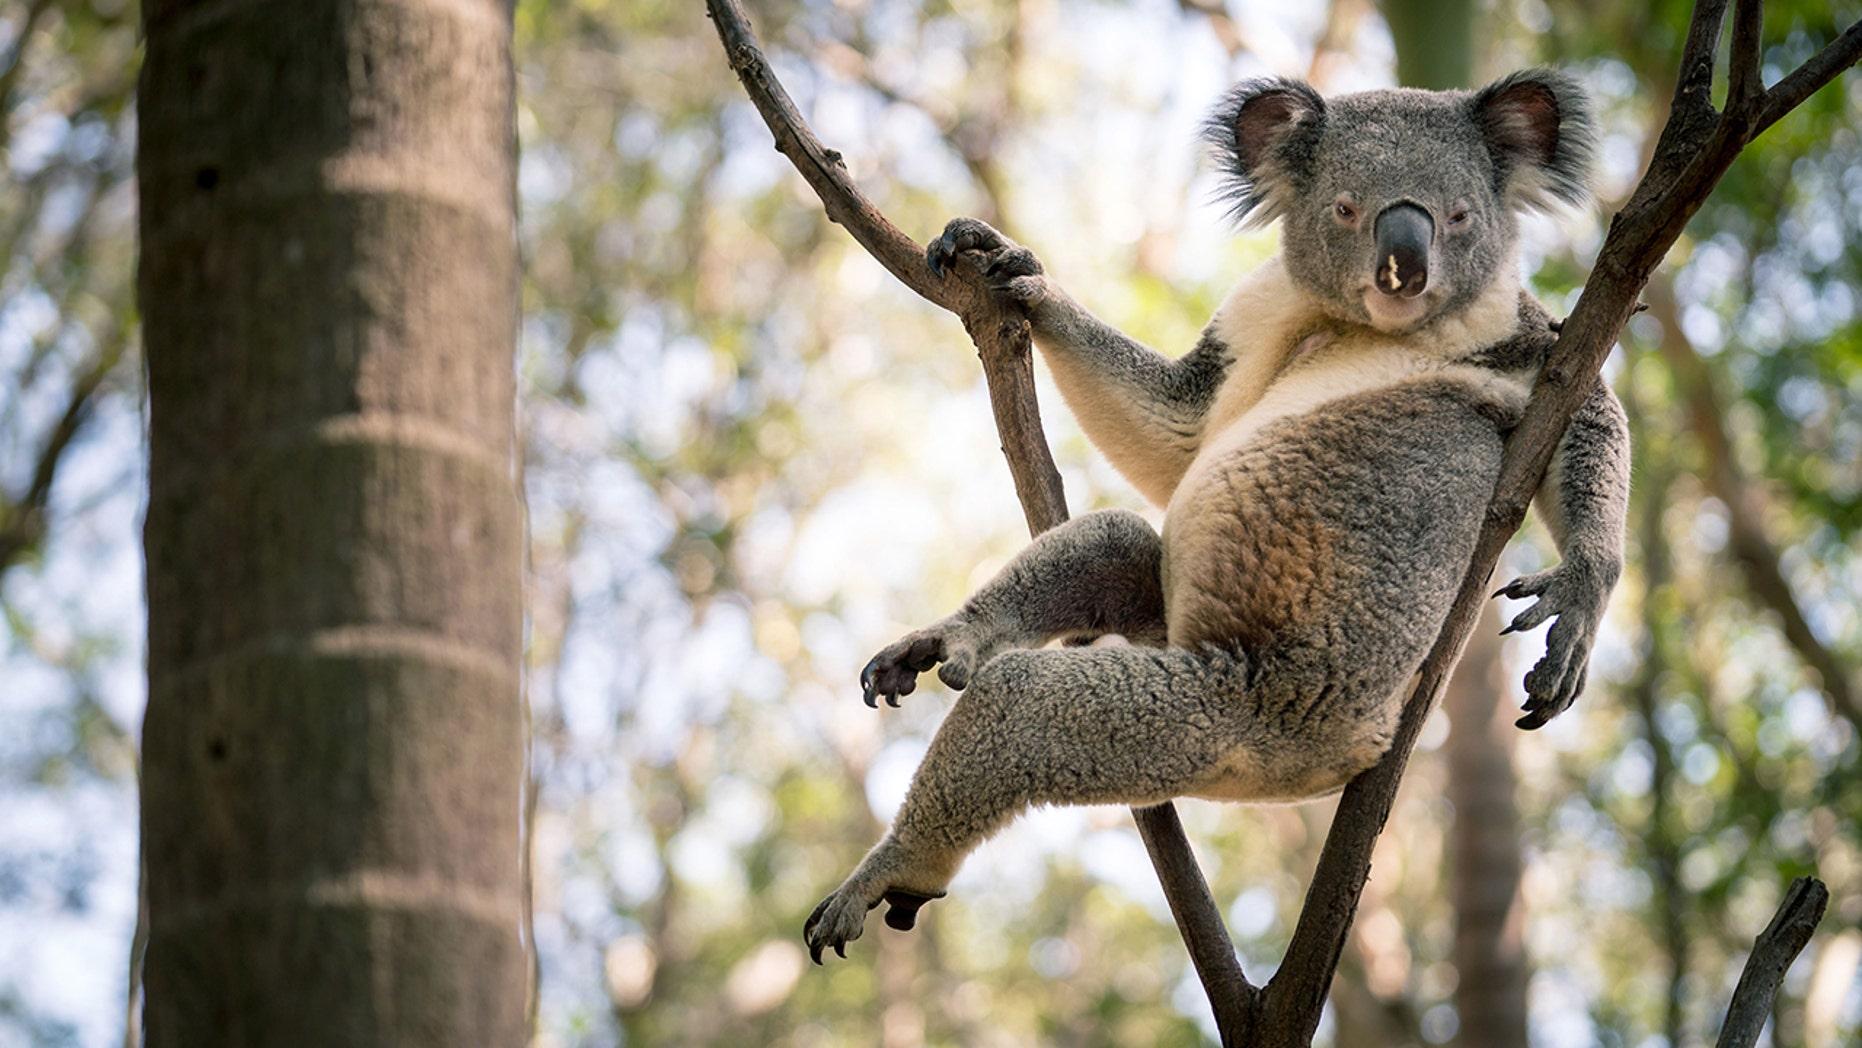 Rogue the koala became an internet sensation after striking a seductive pose.